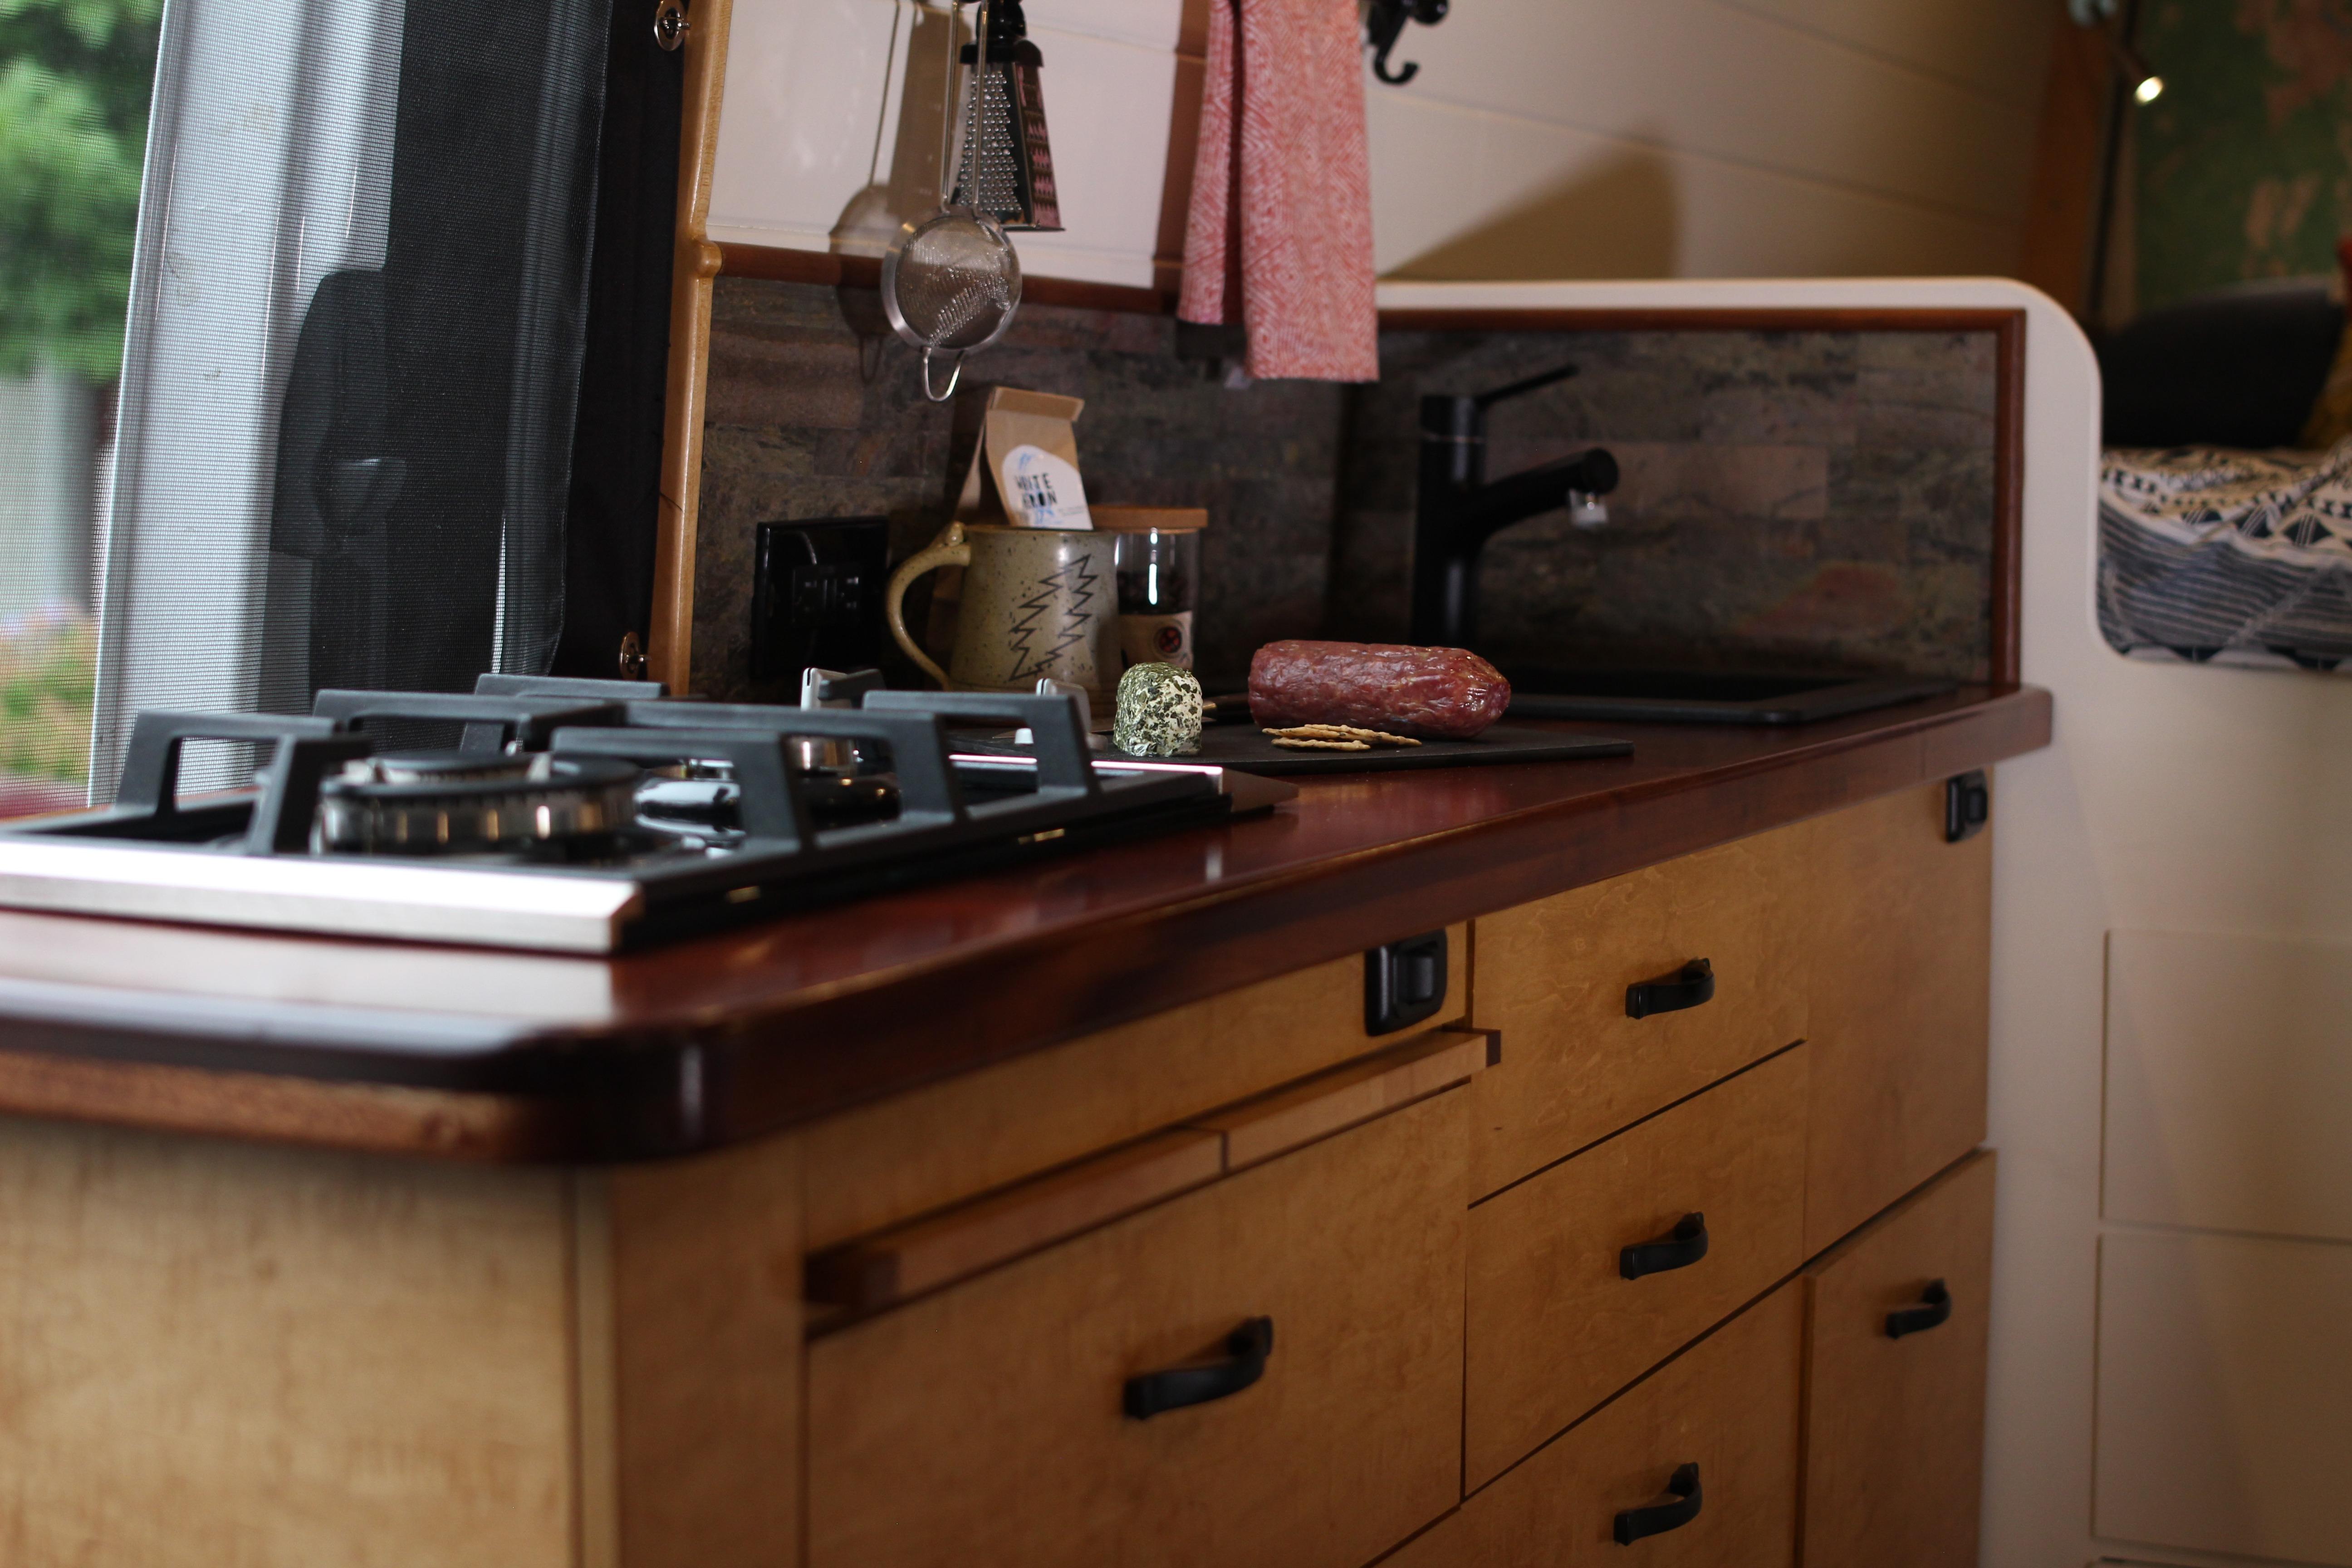 A cook's kitchen for the culinary adventurer.. Mercedes-Benz Sprinter 2012